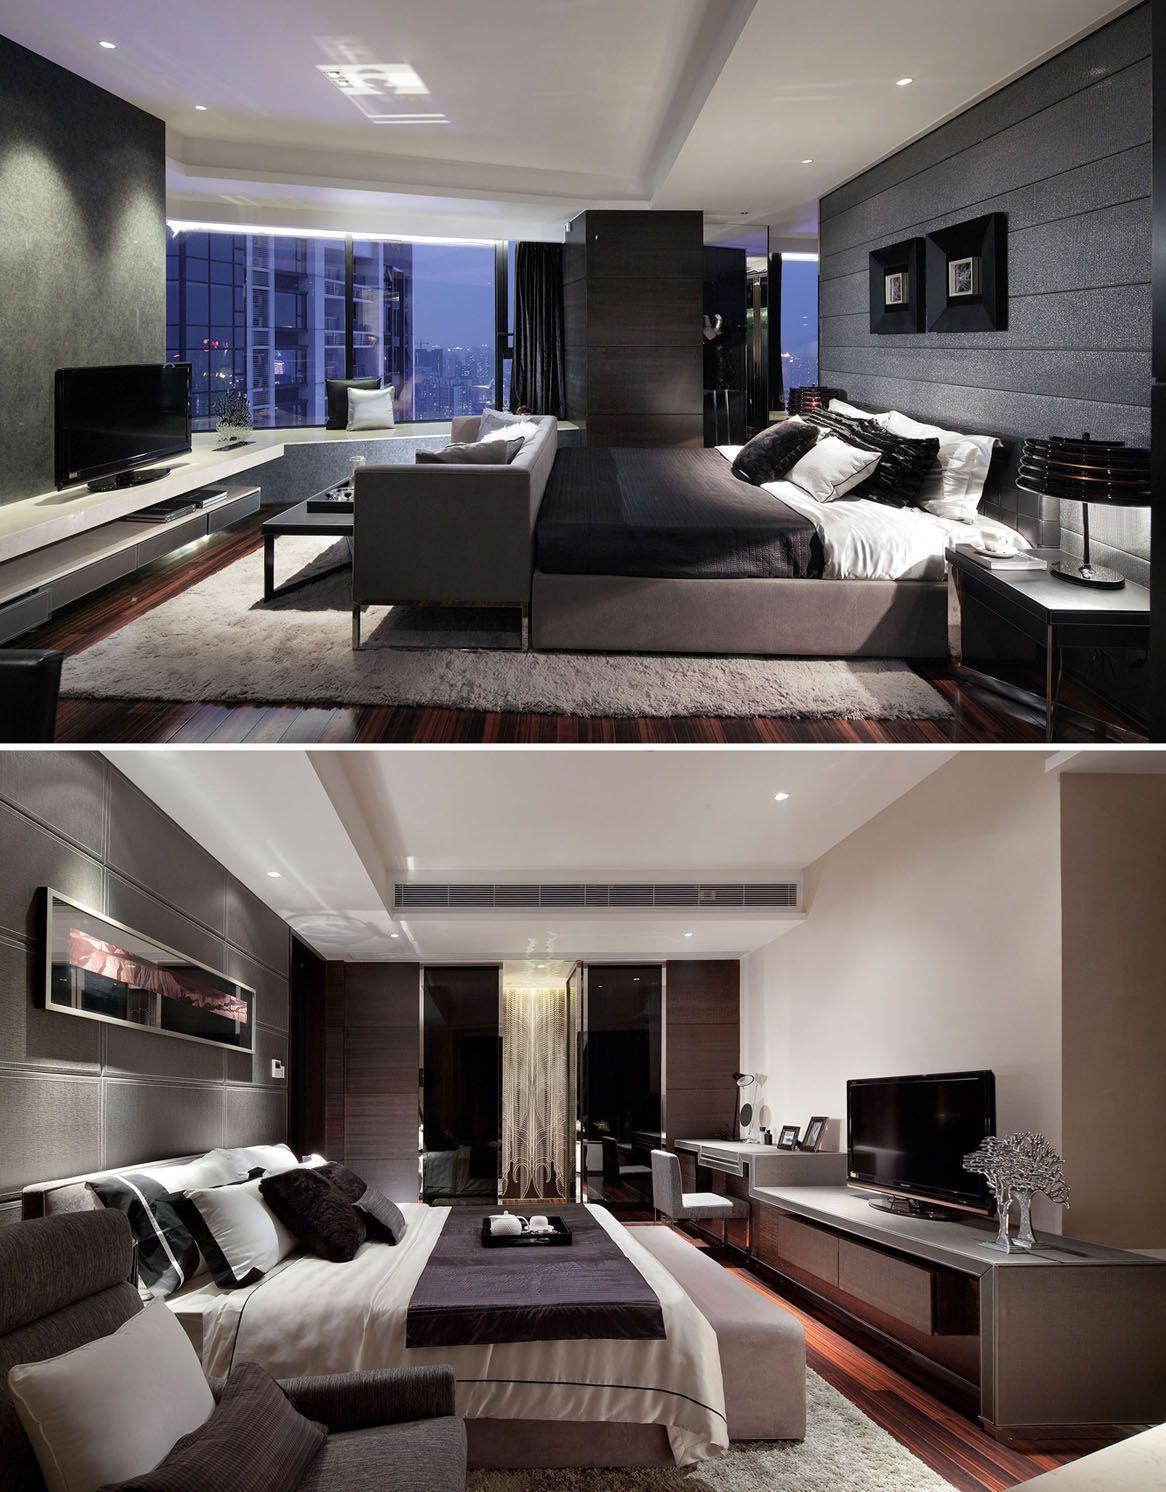 Modern Luxury Bedroom Design 2021 In 2020 Modern Luxury Bedroom Luxurious Bedrooms Luxury Bedroom Design